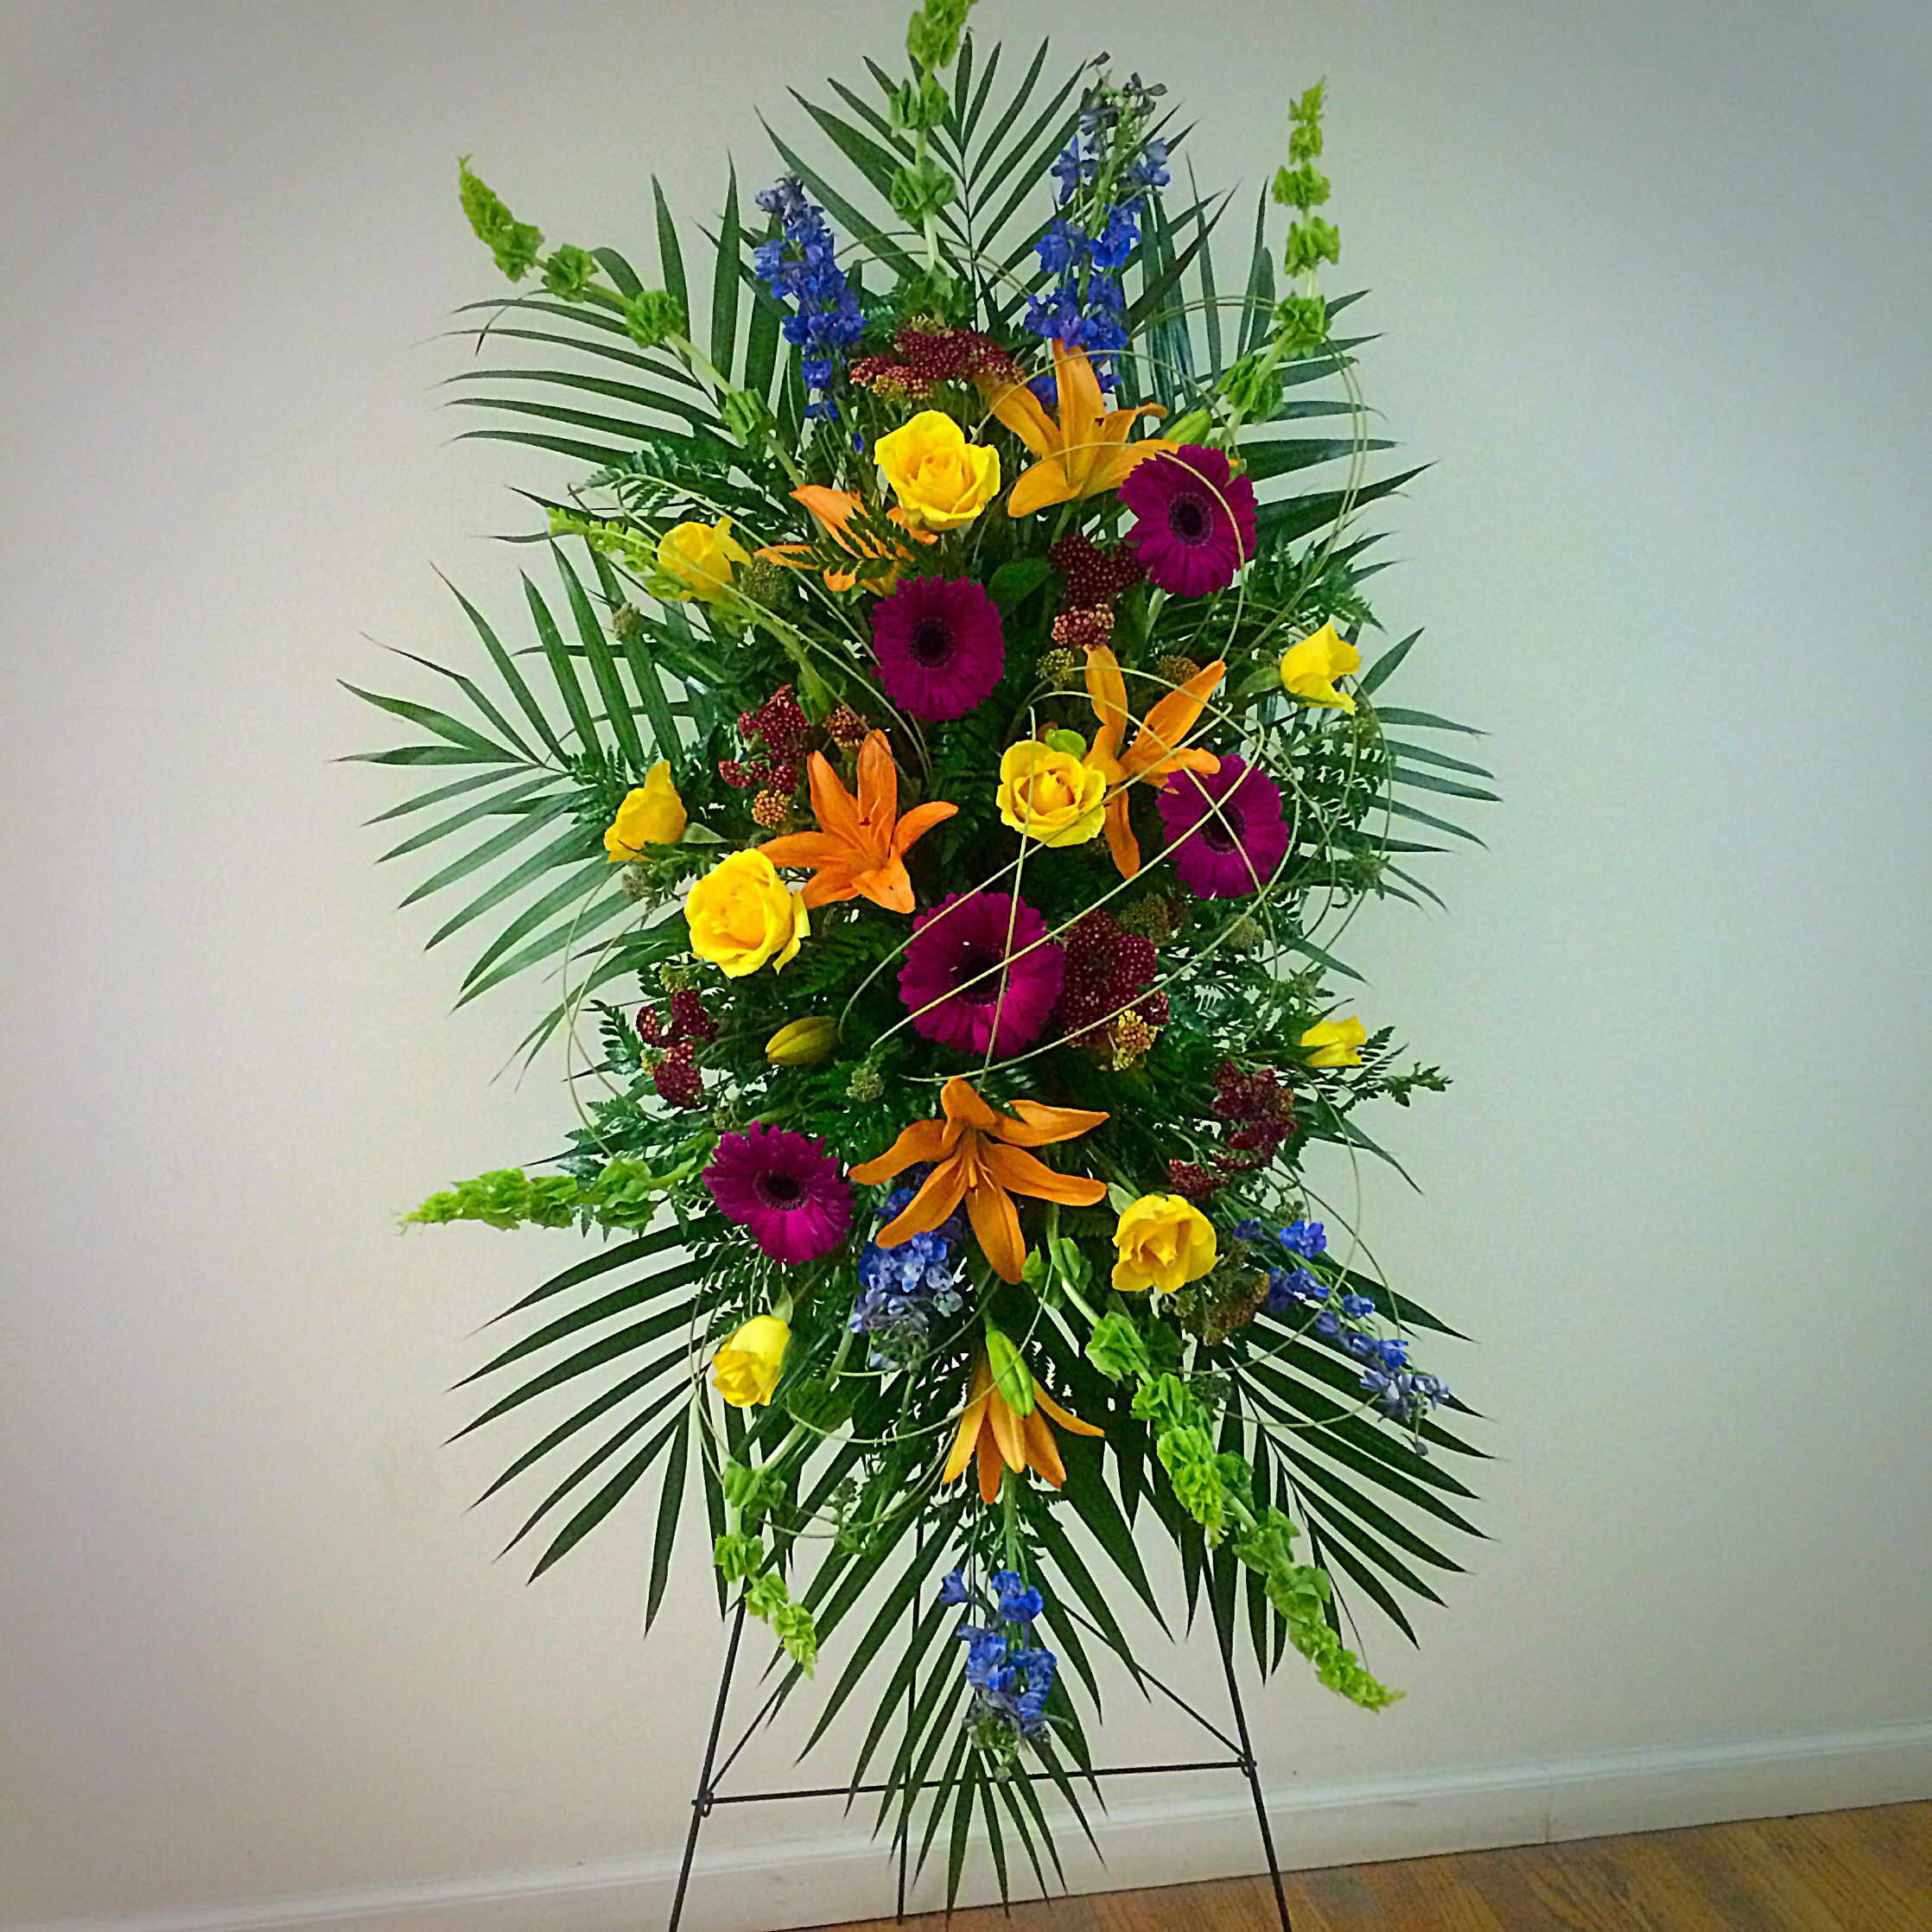 Funeral flower arrangement modern hanging easel terris flower funeral flower arrangement modern hanging easel terris flower shop by samantha izmirmasajfo Image collections